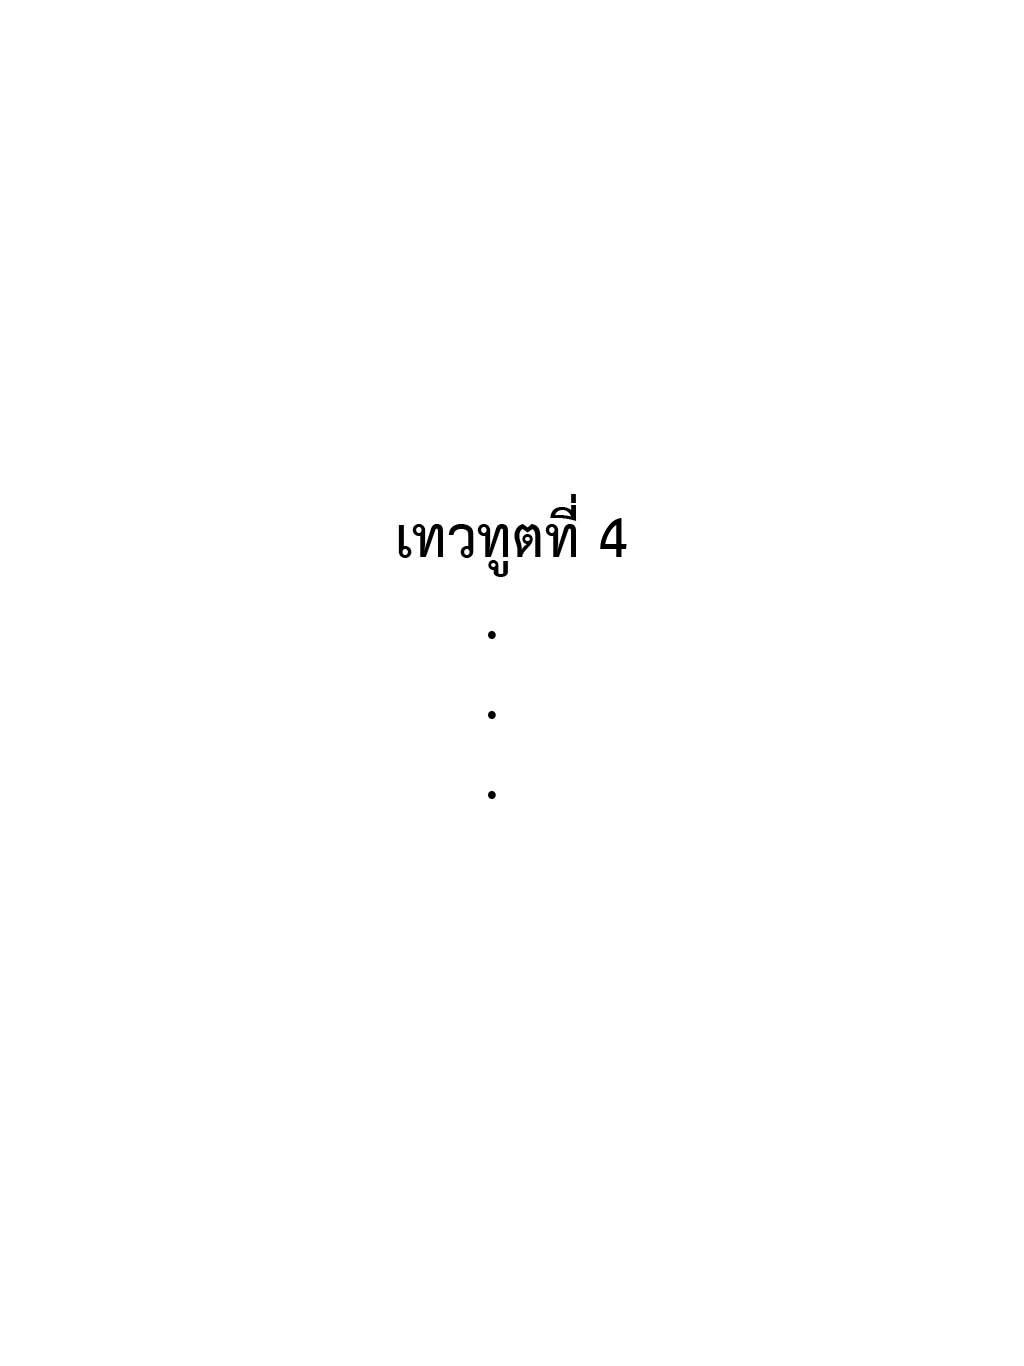 WANTED - เทวทูตที่ 4